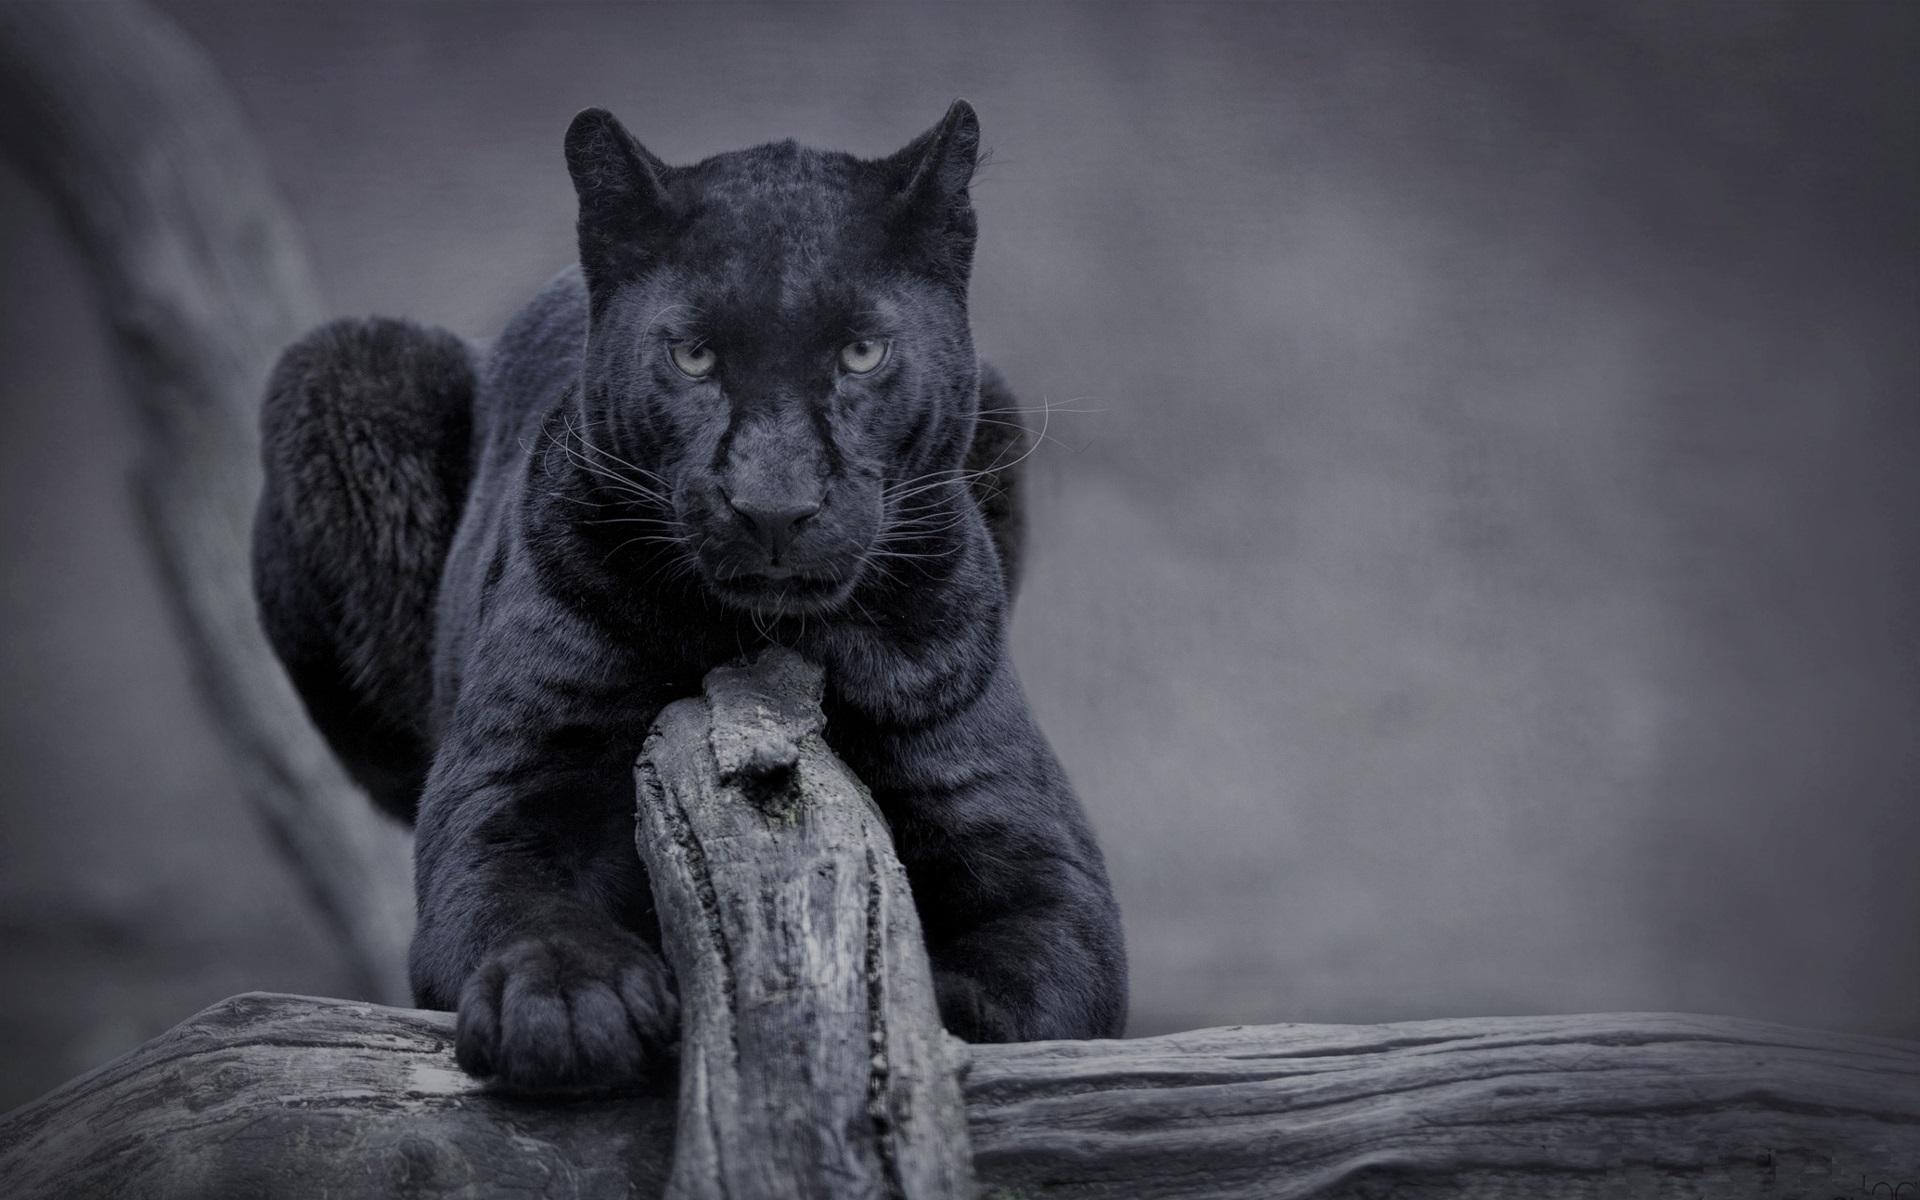 Fondos 4k Hd De Panteras Negras: Fondos De Pantalla Pantera Negra, Vida Silvestre, Vista